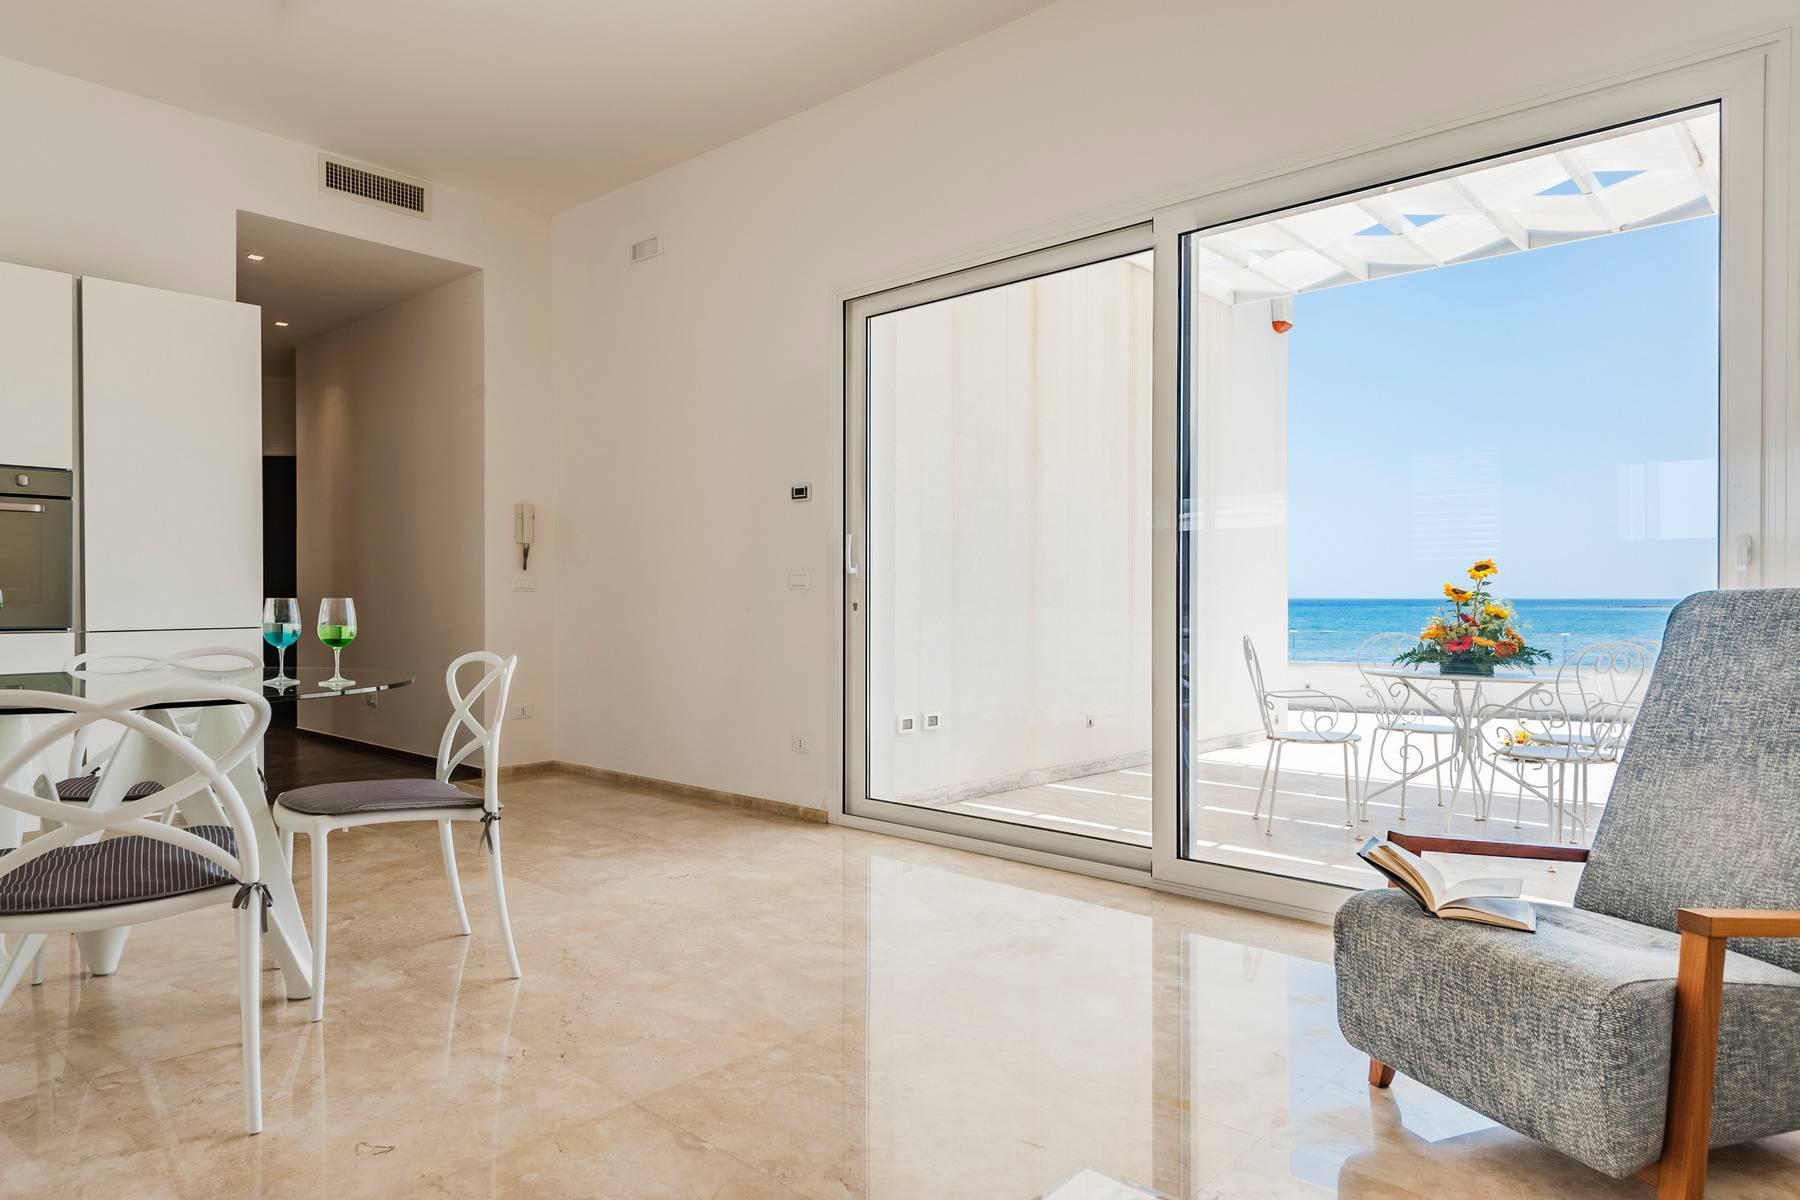 Exclusive villa with sea view in Avola - 3